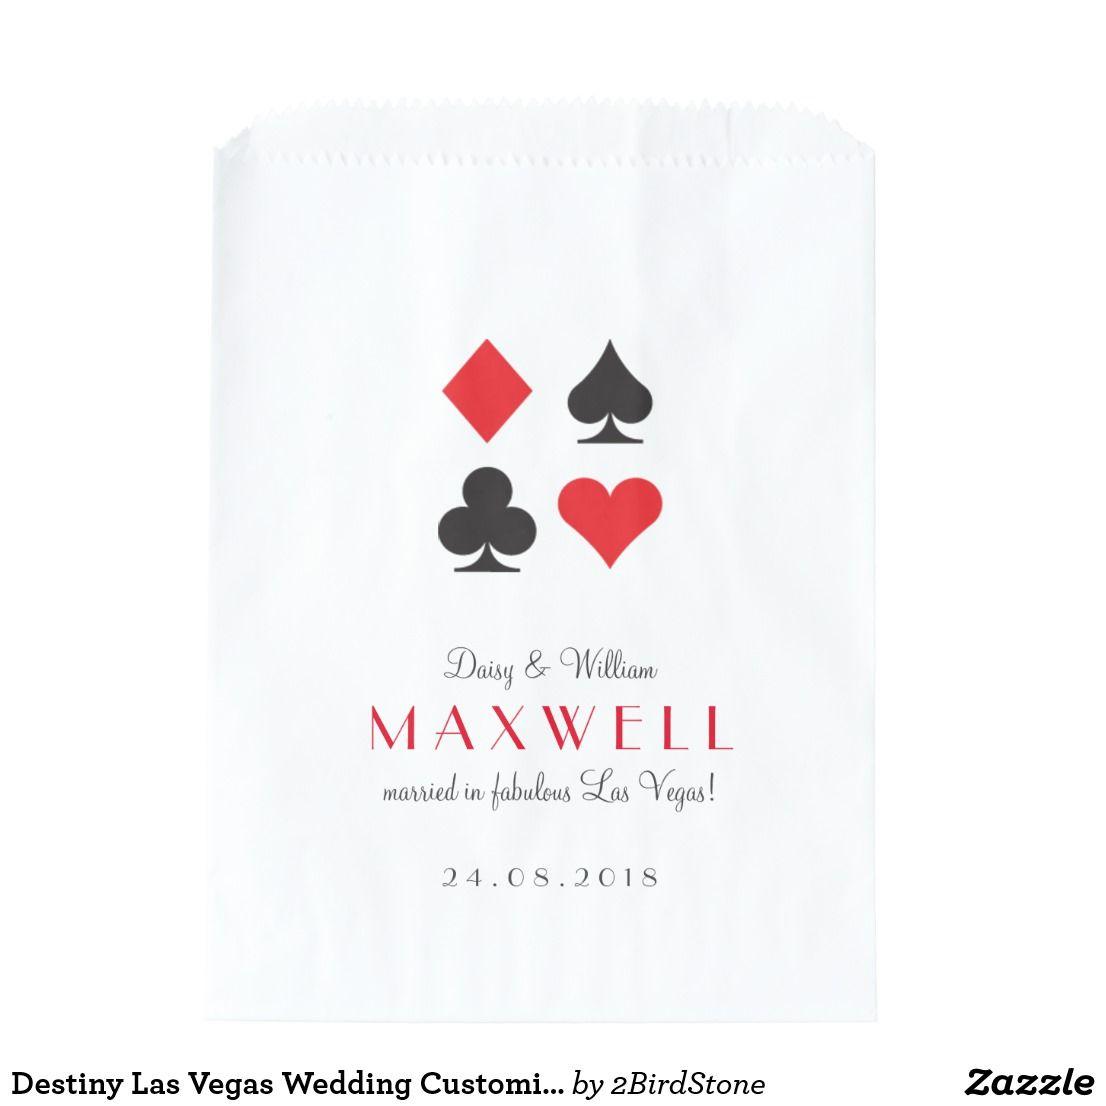 Destiny Las Vegas Wedding Customized Favor Bag | Favor bags, Favors ...